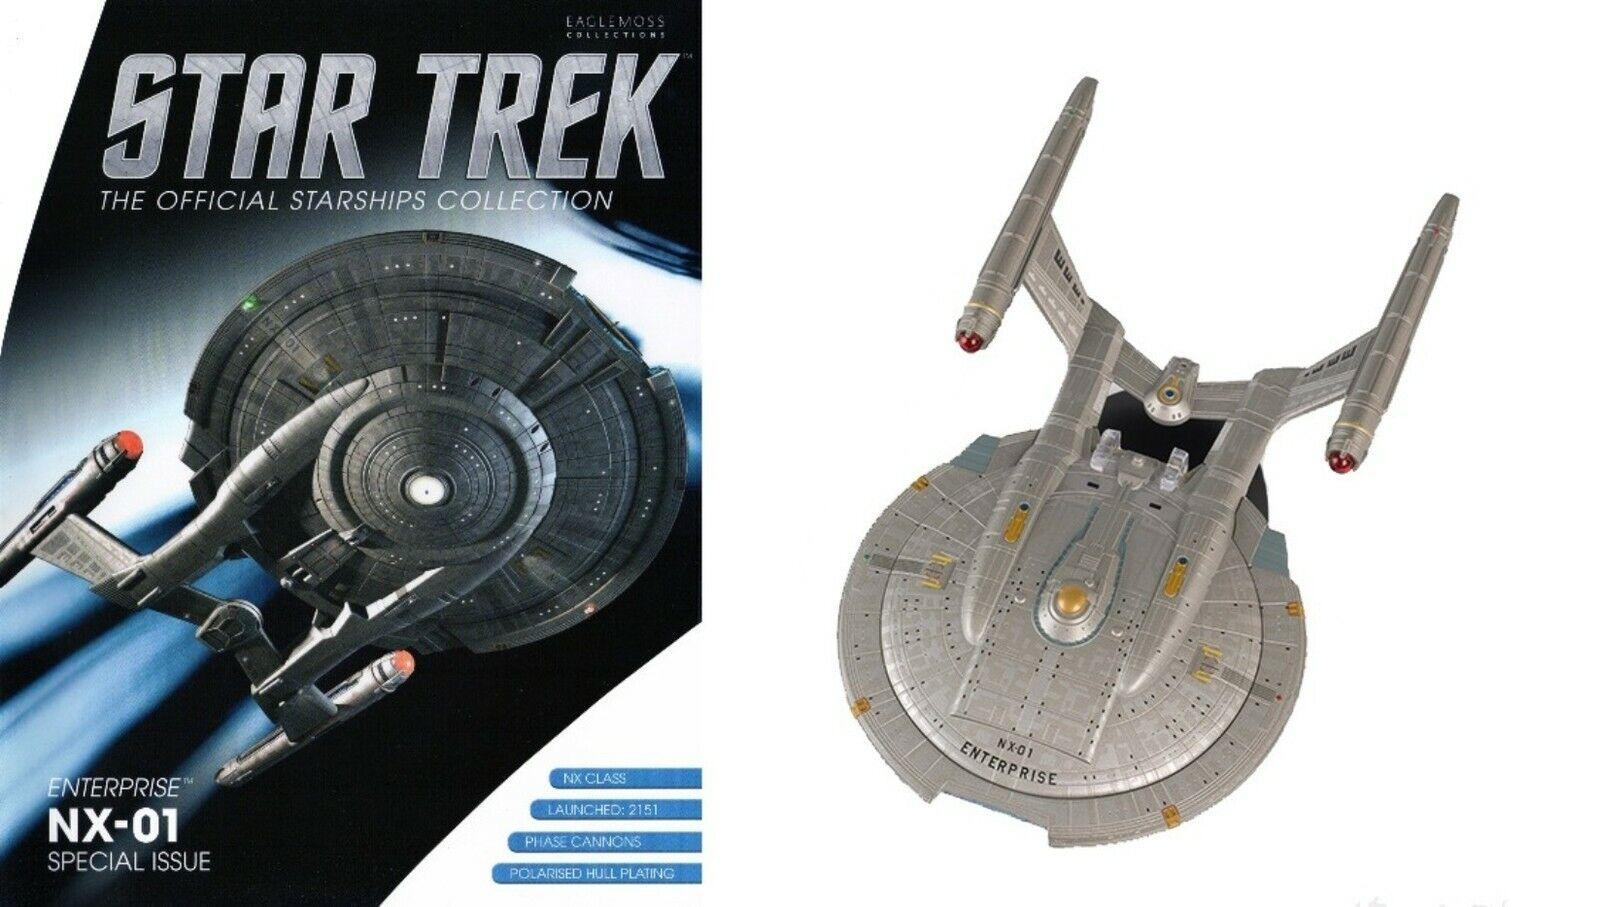 Enterprise NX-01 Edición Especial Star Trek EAGLEMOSS Grande Con Revista STMG 04